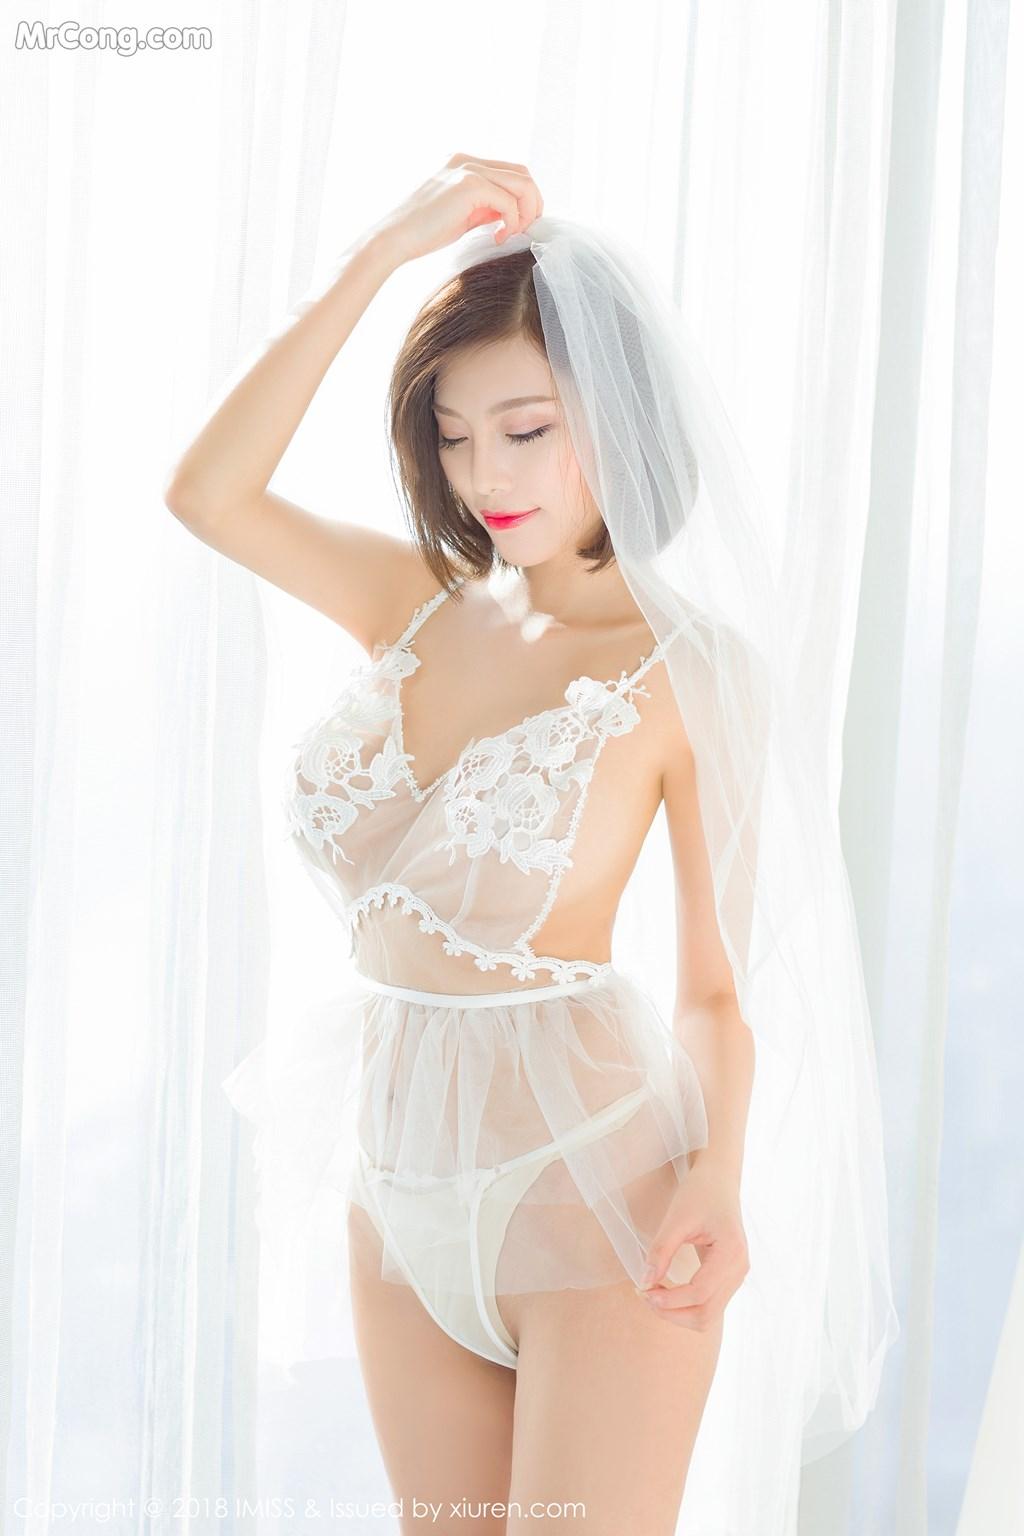 Image IMISS-Vol.260-Yang-Chen-Chen-sugar-MrCong.com-005 in post IMISS Vol.260: Người mẫu Yang Chen Chen (杨晨晨sugar) (36 ảnh)